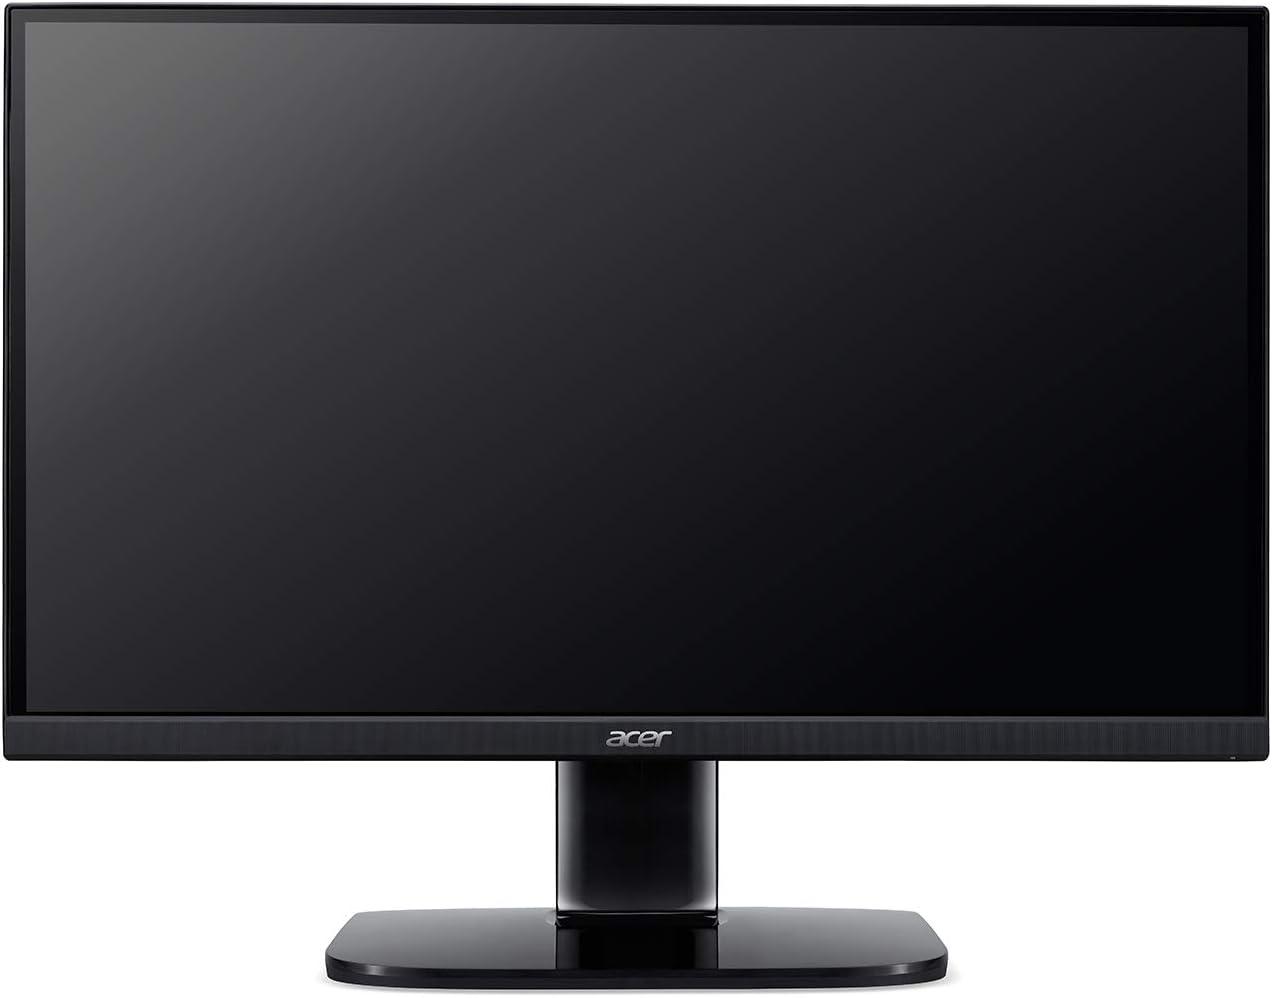 "Acer KA2-23.8"" Full HD 1920x1080 75Hz IPS 16:9 1ms VRB 250Nit HDMI (Renewed)"